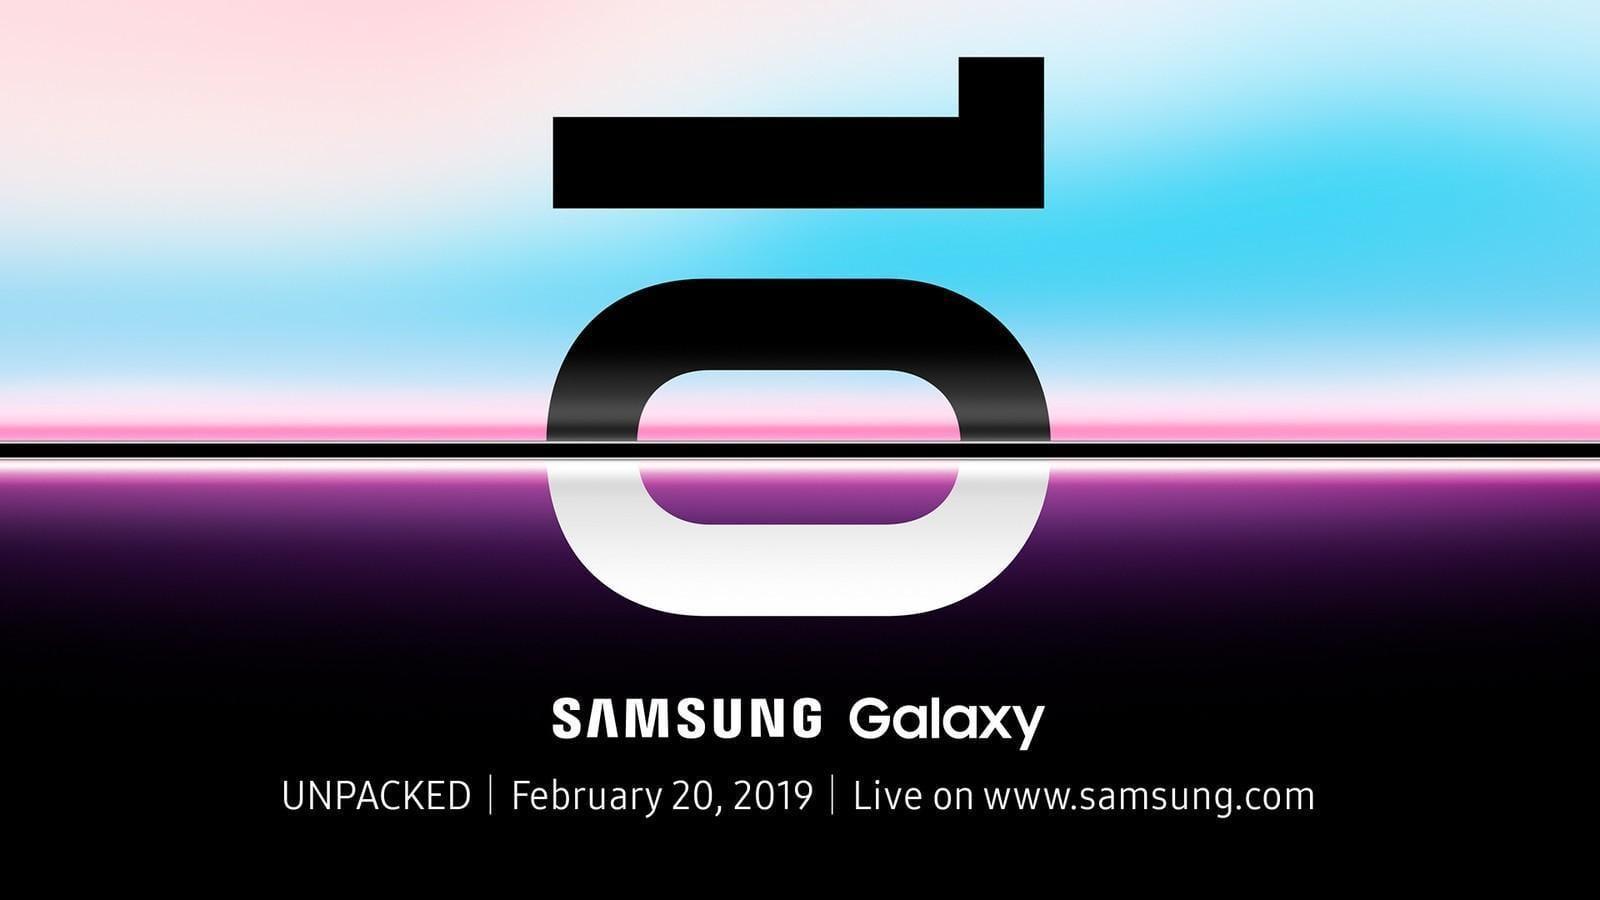 Всё о Samsung Galaxy S10: новости, слухи, дата выхода, тех. характеристики и другое (samsung galaxy unpackd 2019 official invitation)